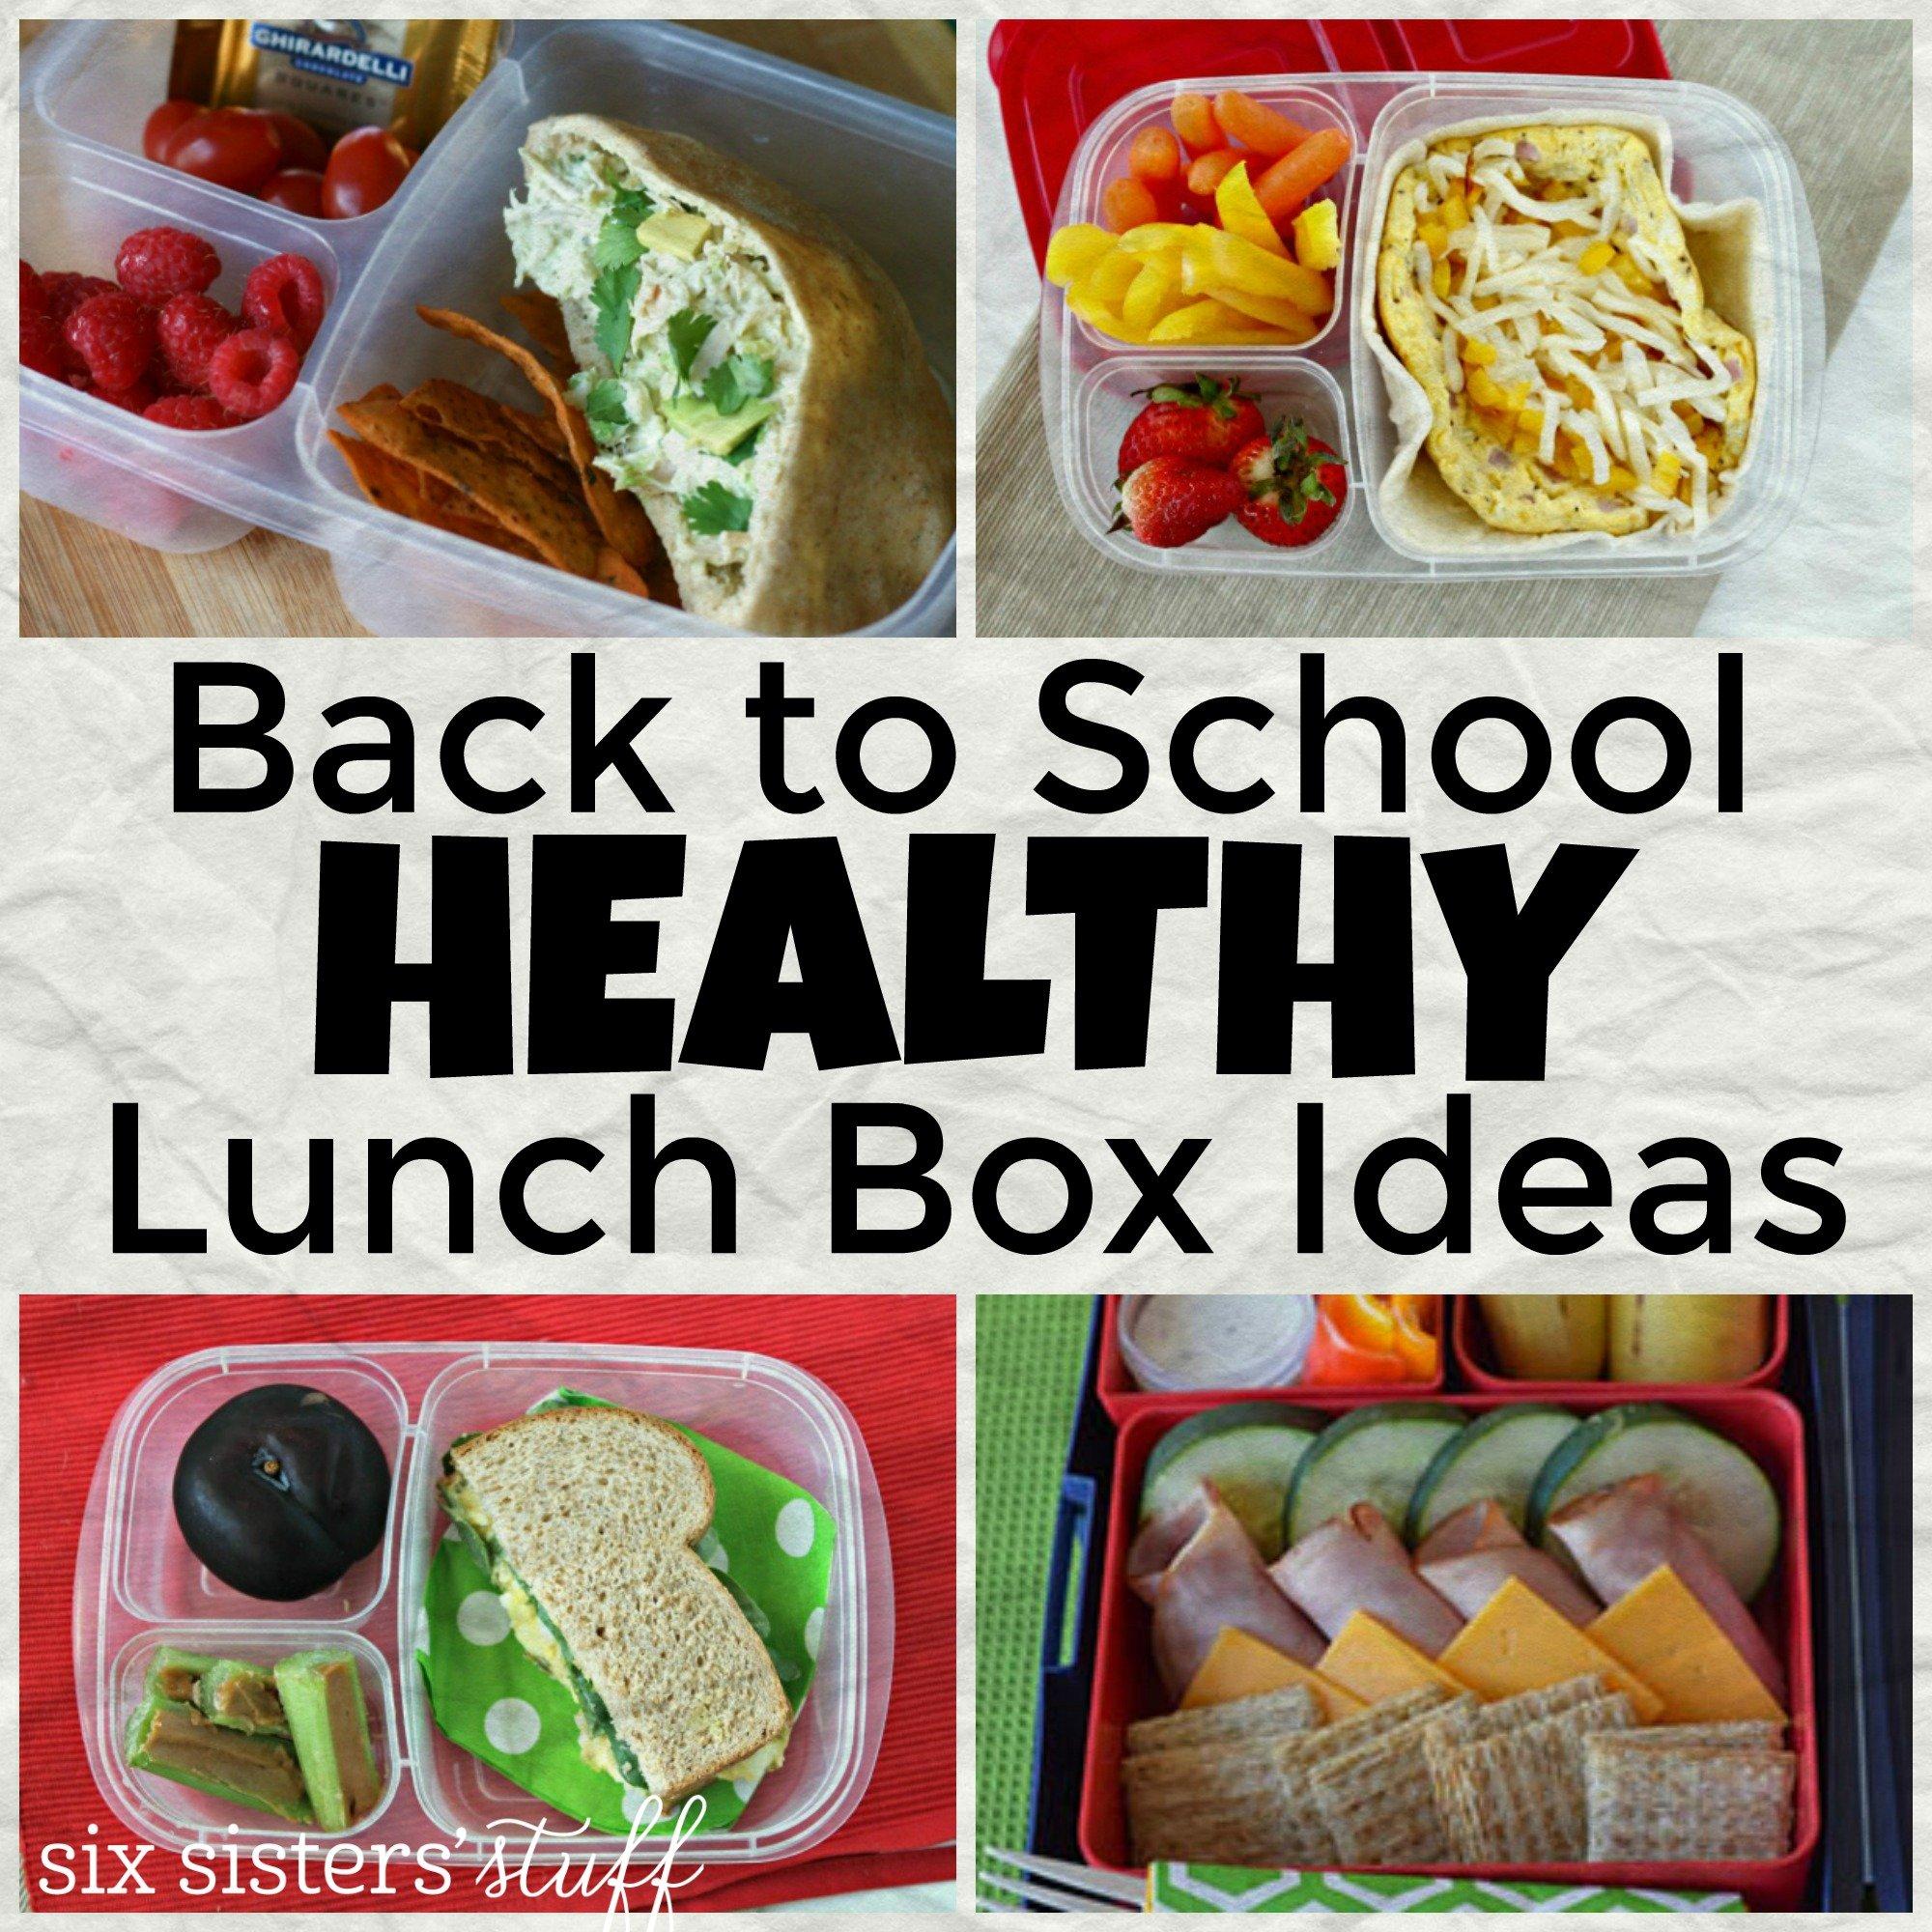 Back to School Healthy Lunch Box Ideas